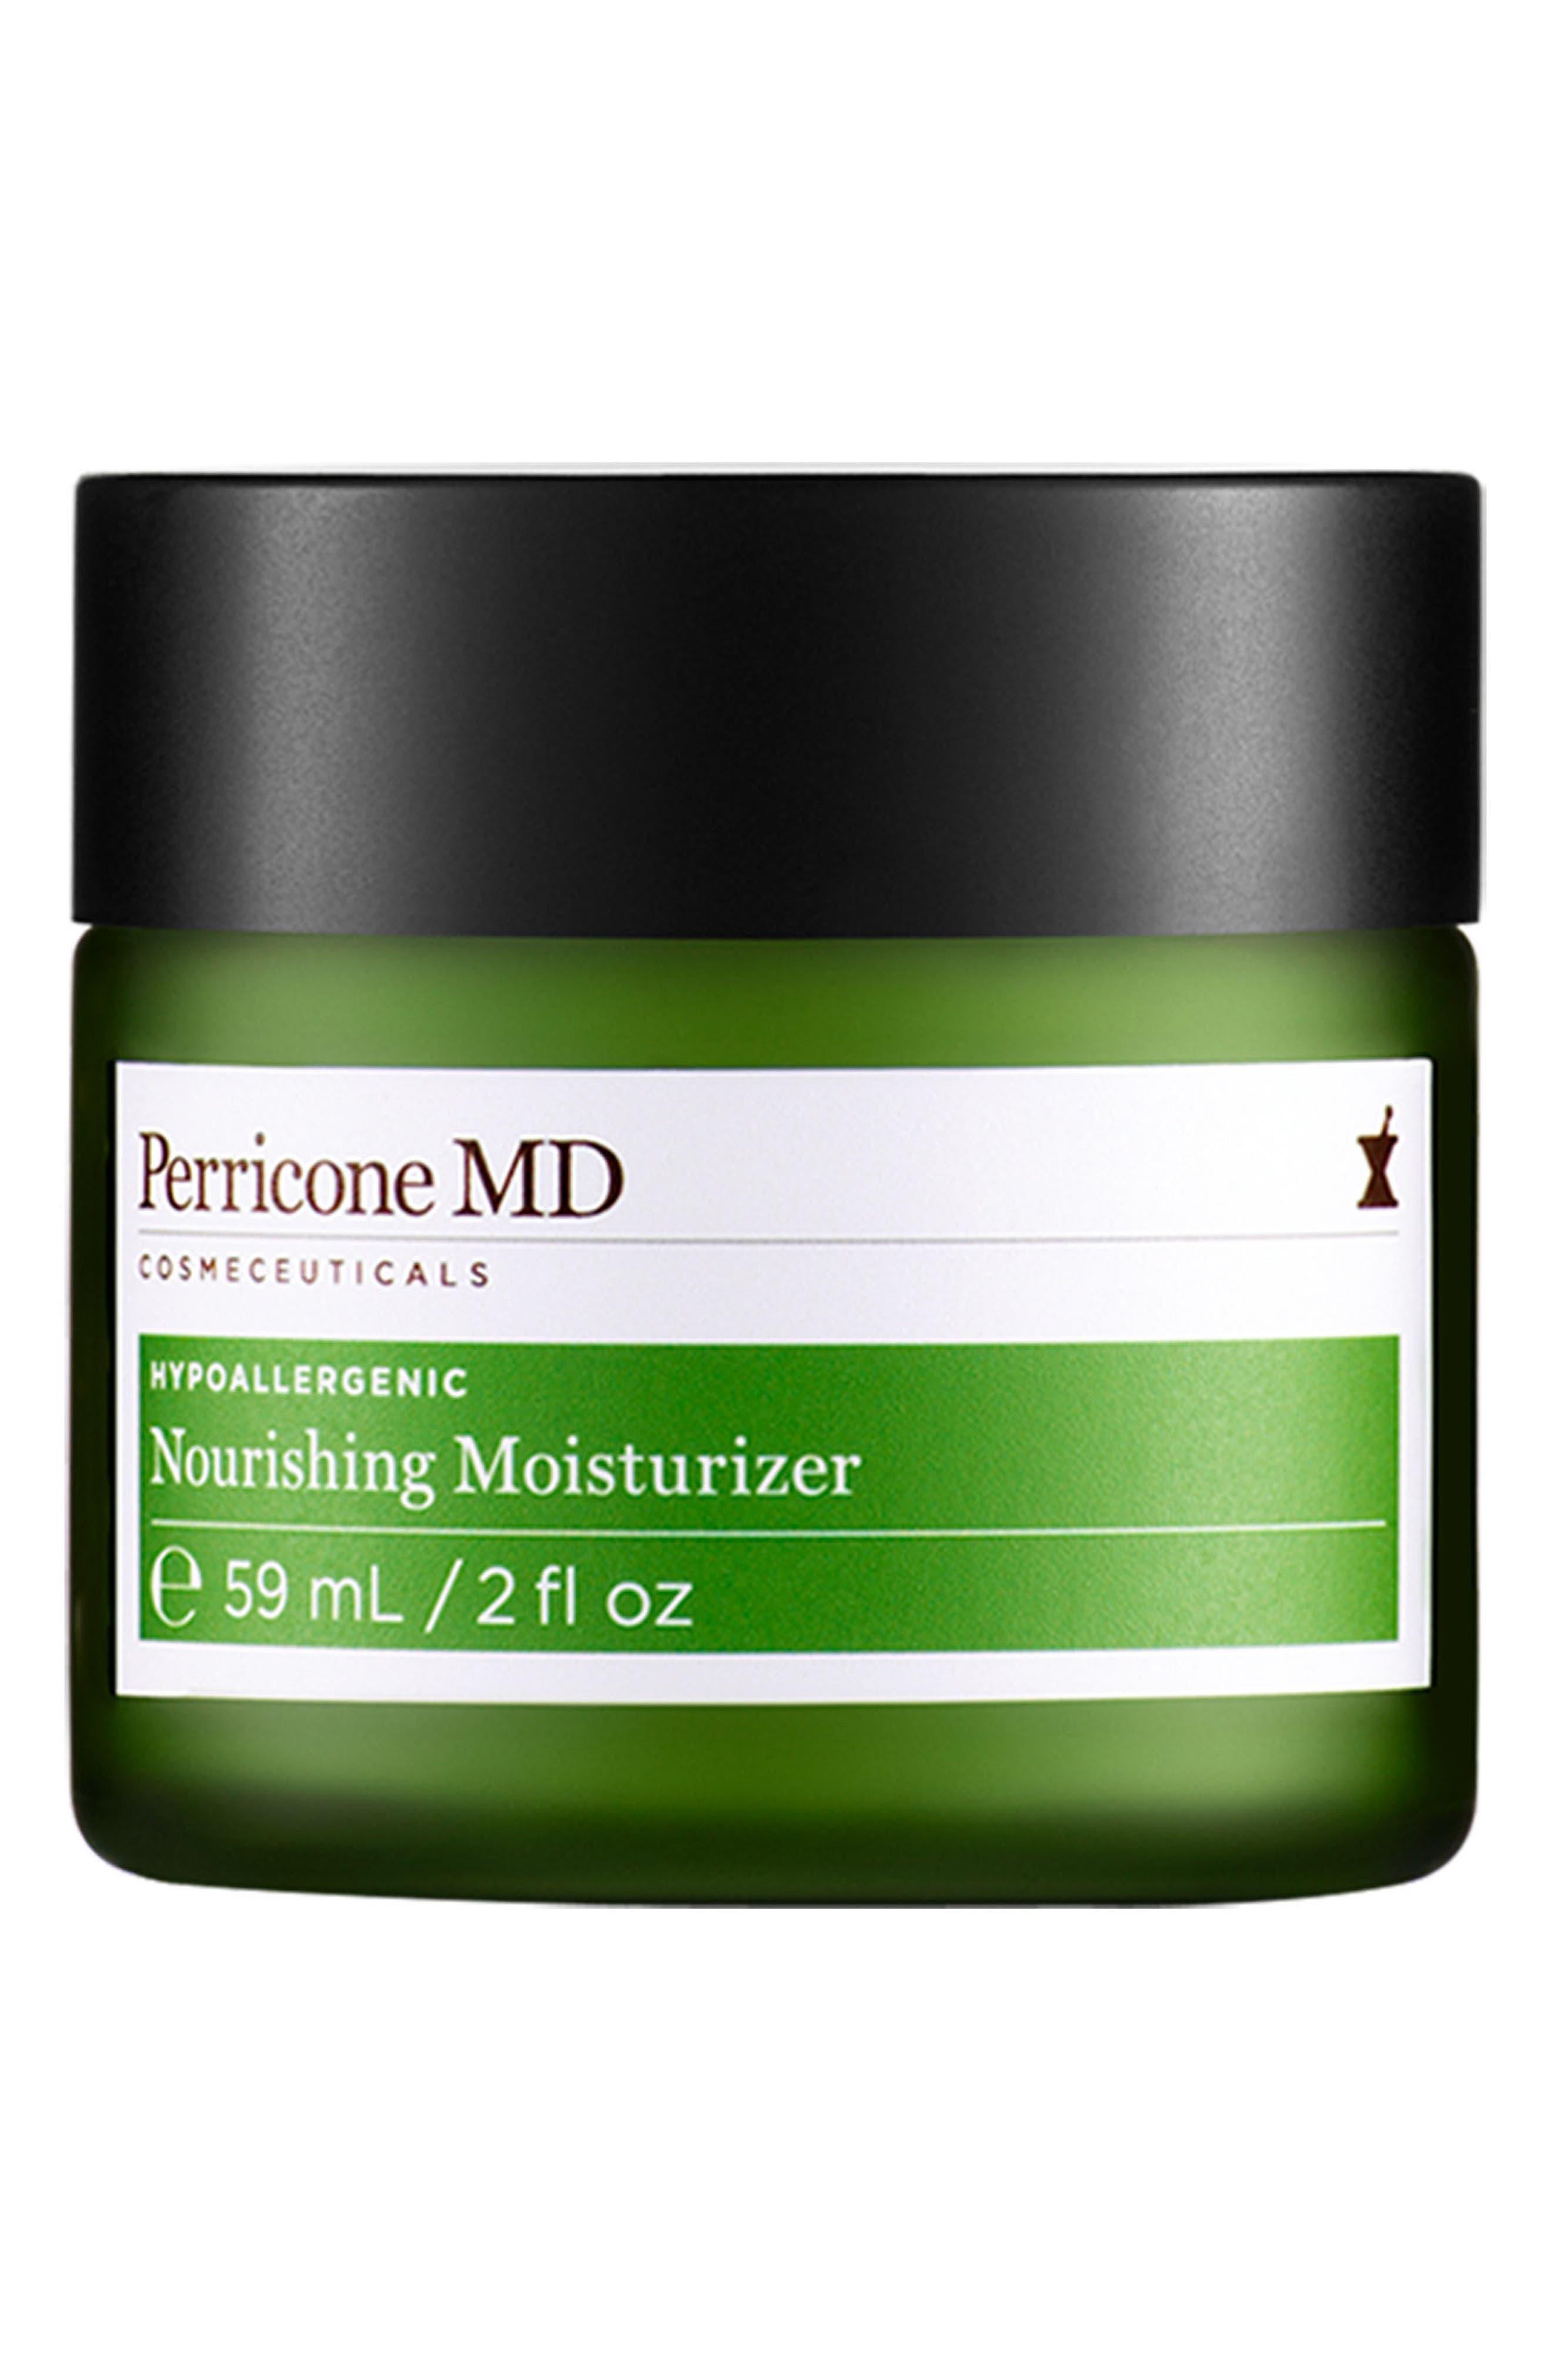 Alternate Image 1 Selected - Perricone MD Hypoallergenic Nourishing Moisturizer